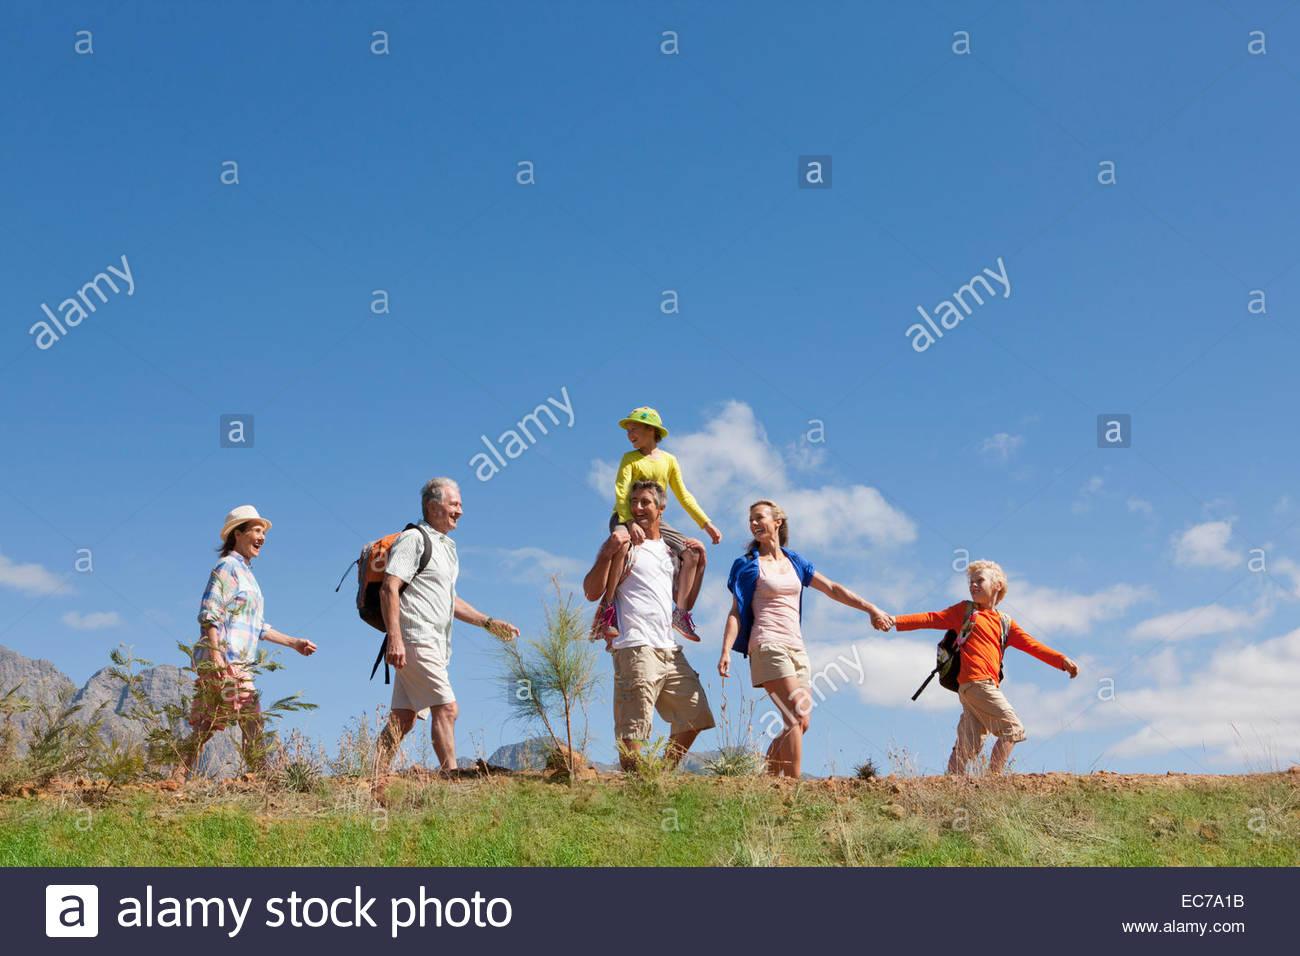 Multi generation family hiking on mountain path - Stock Image